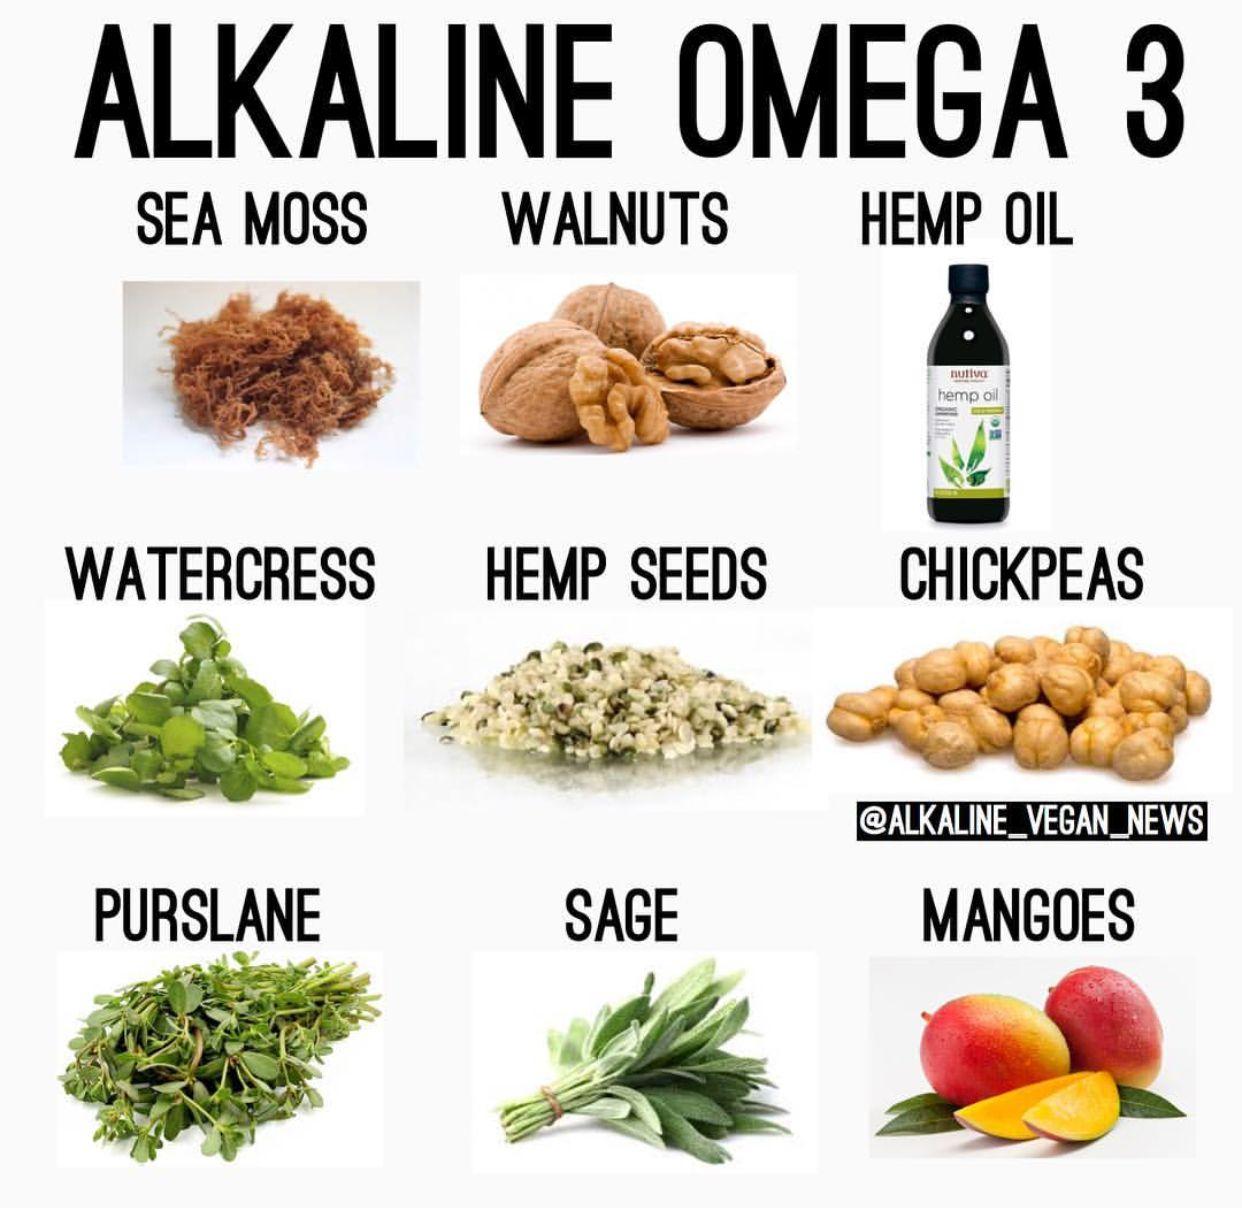 Alkaline Omega 3 Food Dr Sebi Alkaline Food Alkaline Diet Recipes Alkaline Diet